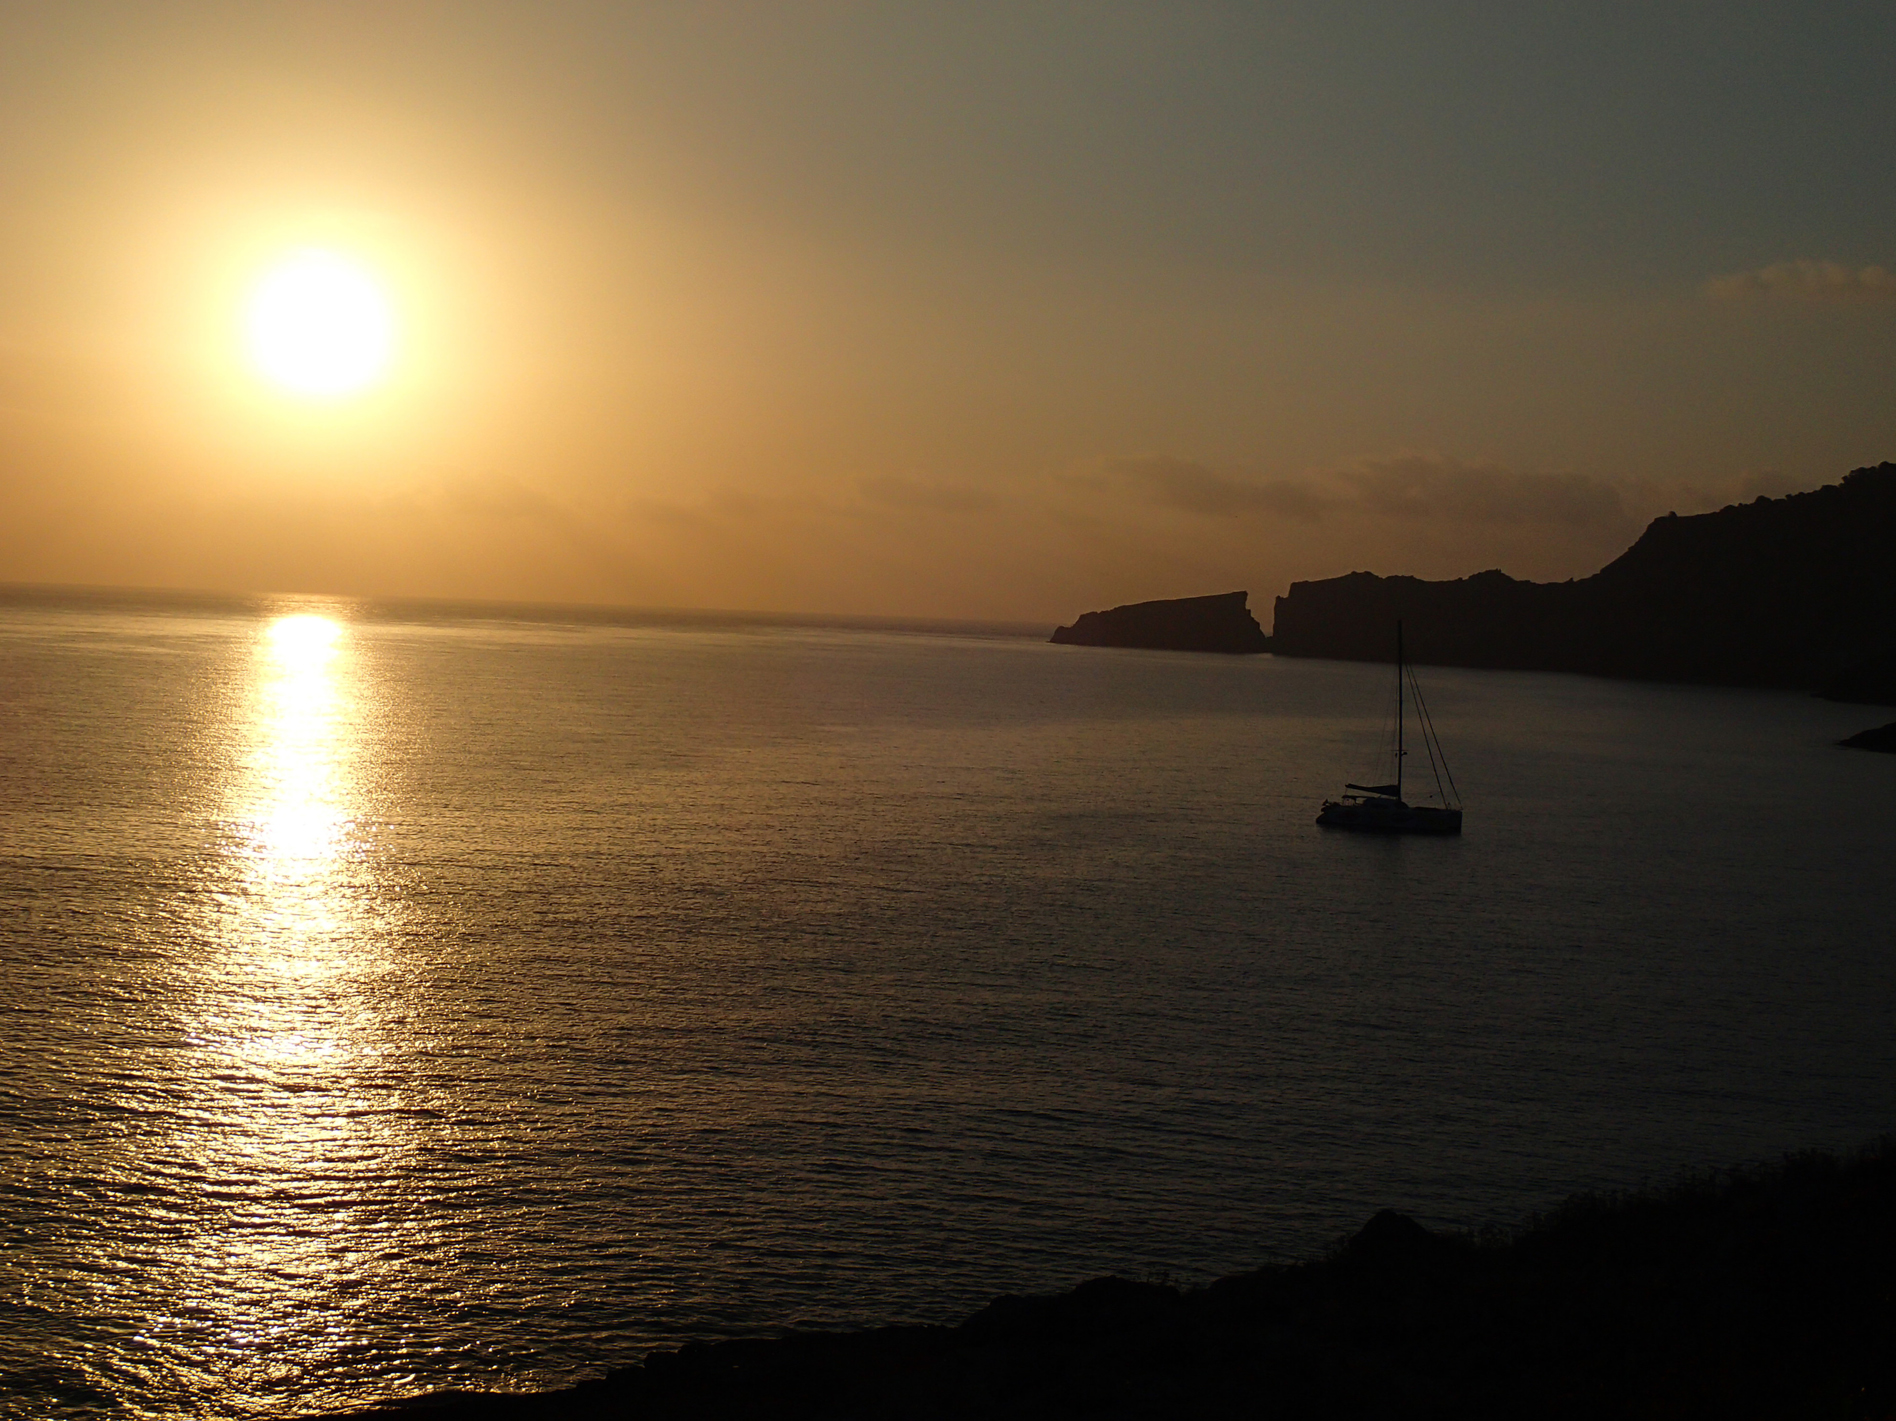 Segelboot bei Sonnenuntergang, goldener Horizont, Inselzunge ragt von rechts ins Bild, ; Mallorca, by Katja Backes-Neuninger, kbn-design.de